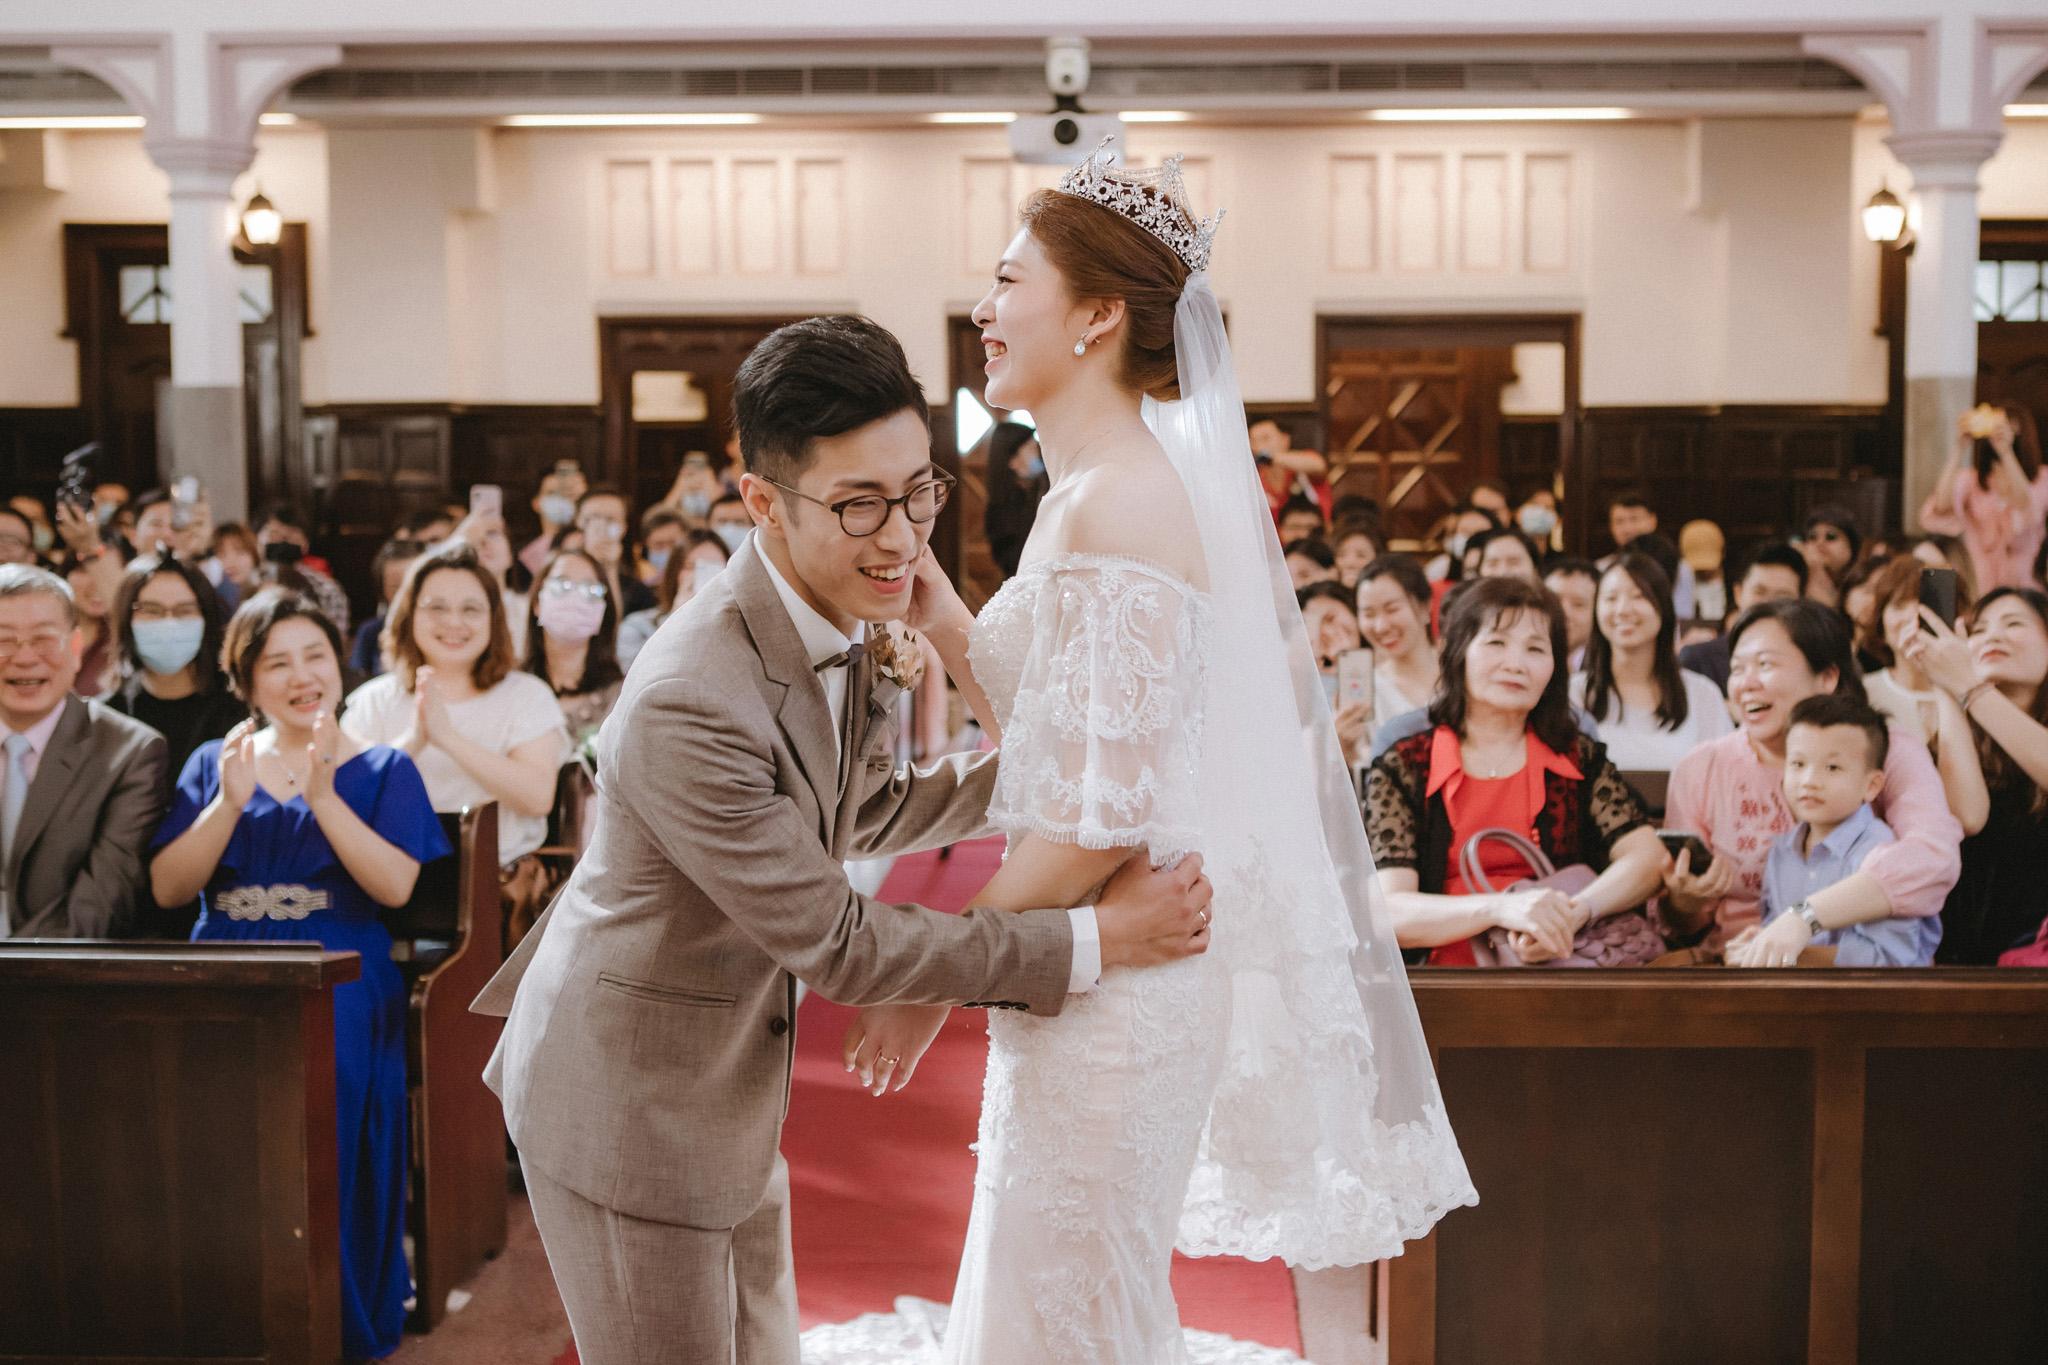 EW 台北婚攝 居米 濟南教會 Brick Yard 33 美軍俱樂部 婚禮 婚宴-35